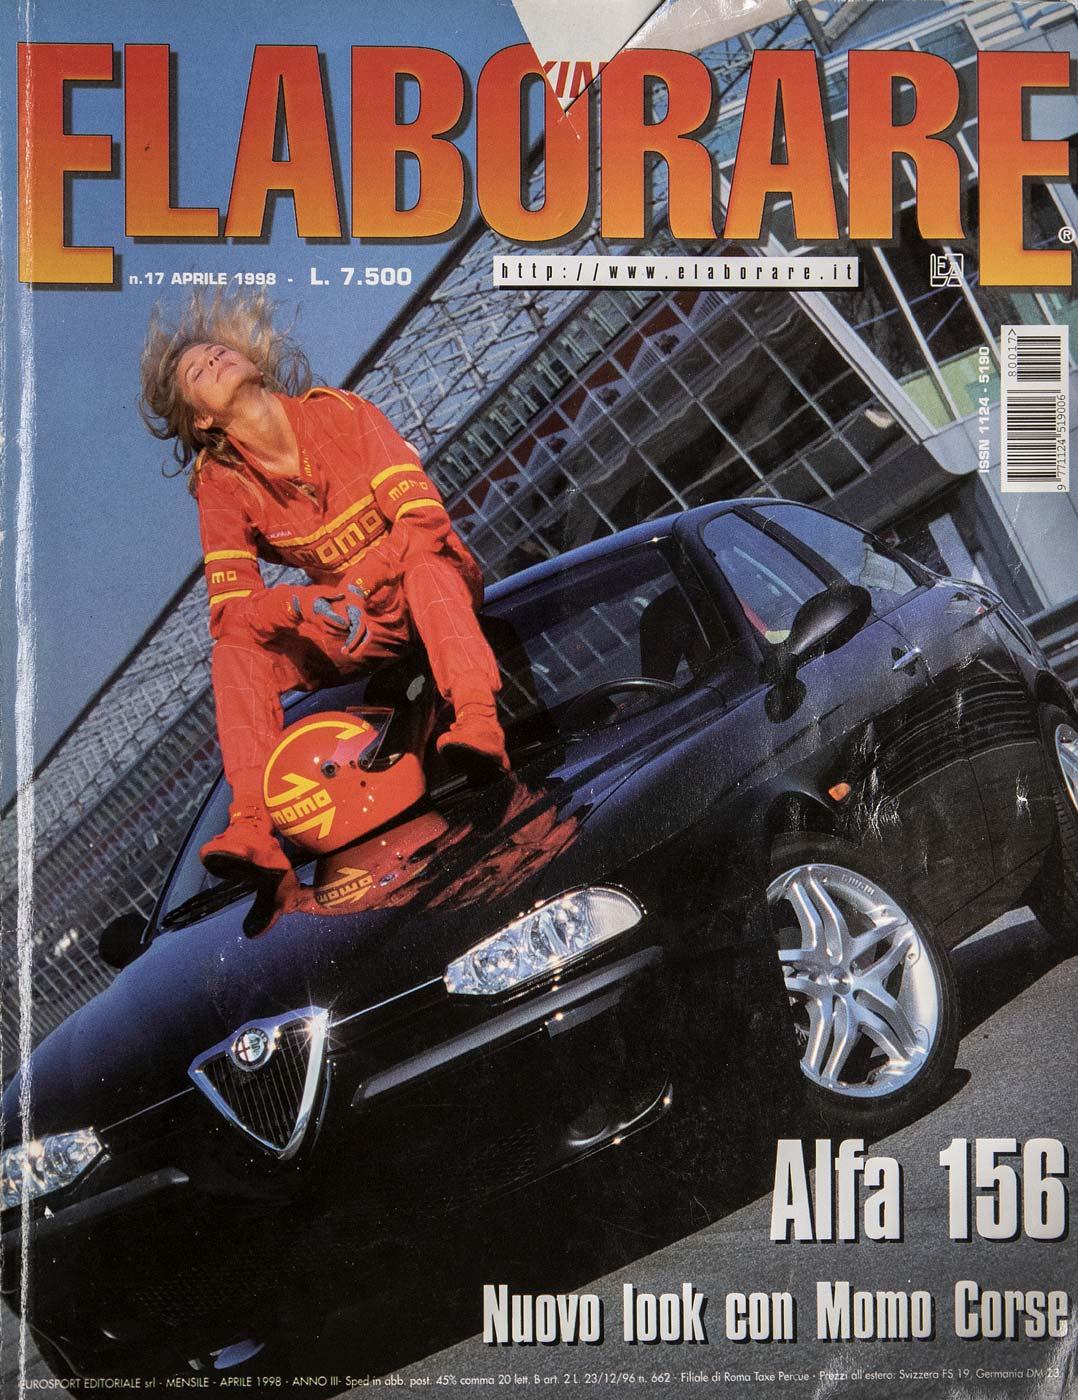 Elaborare n° 17 Aprile 1998